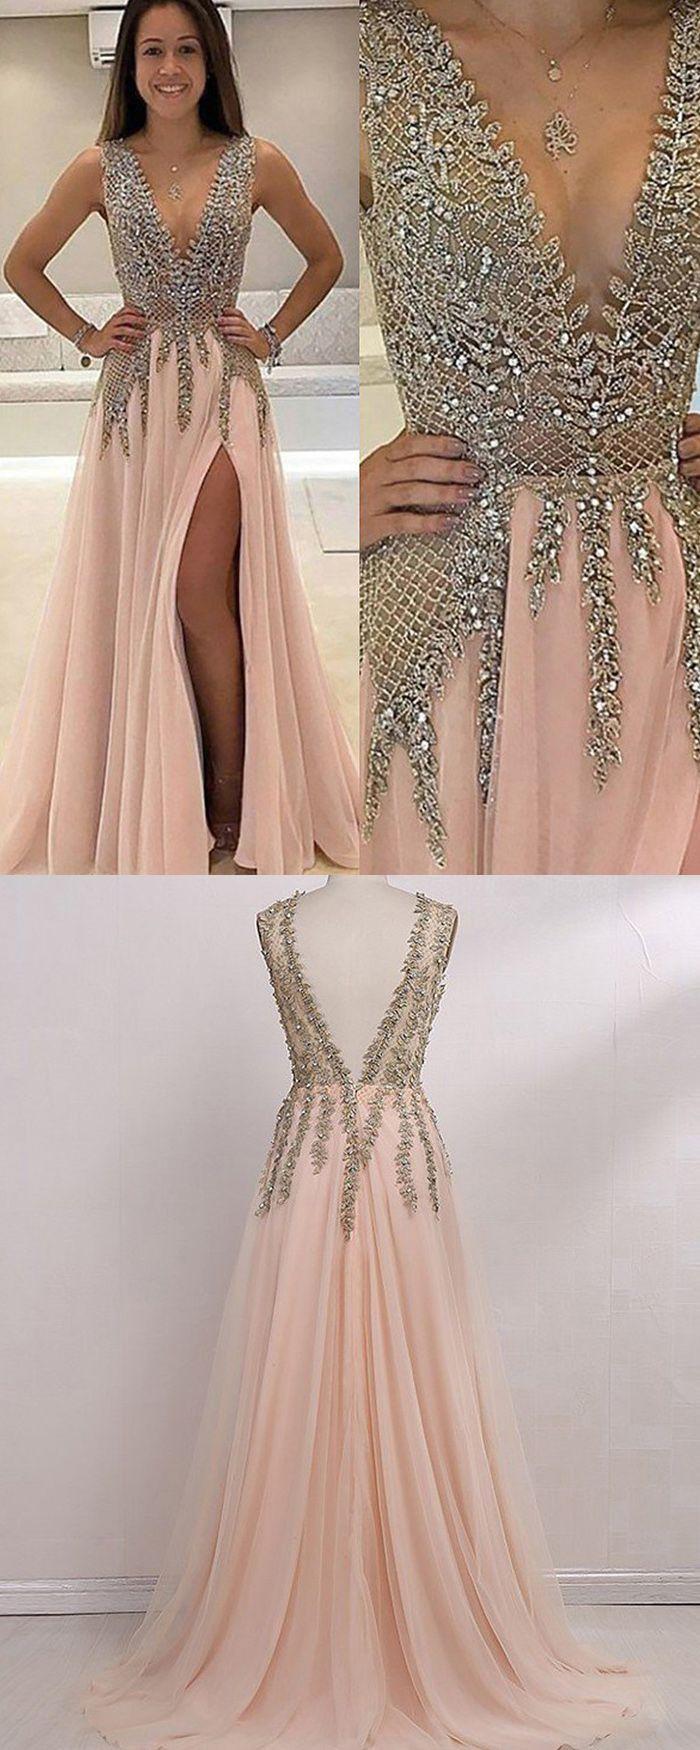 Vneck lace beading bodice pink long prom dress with side slit